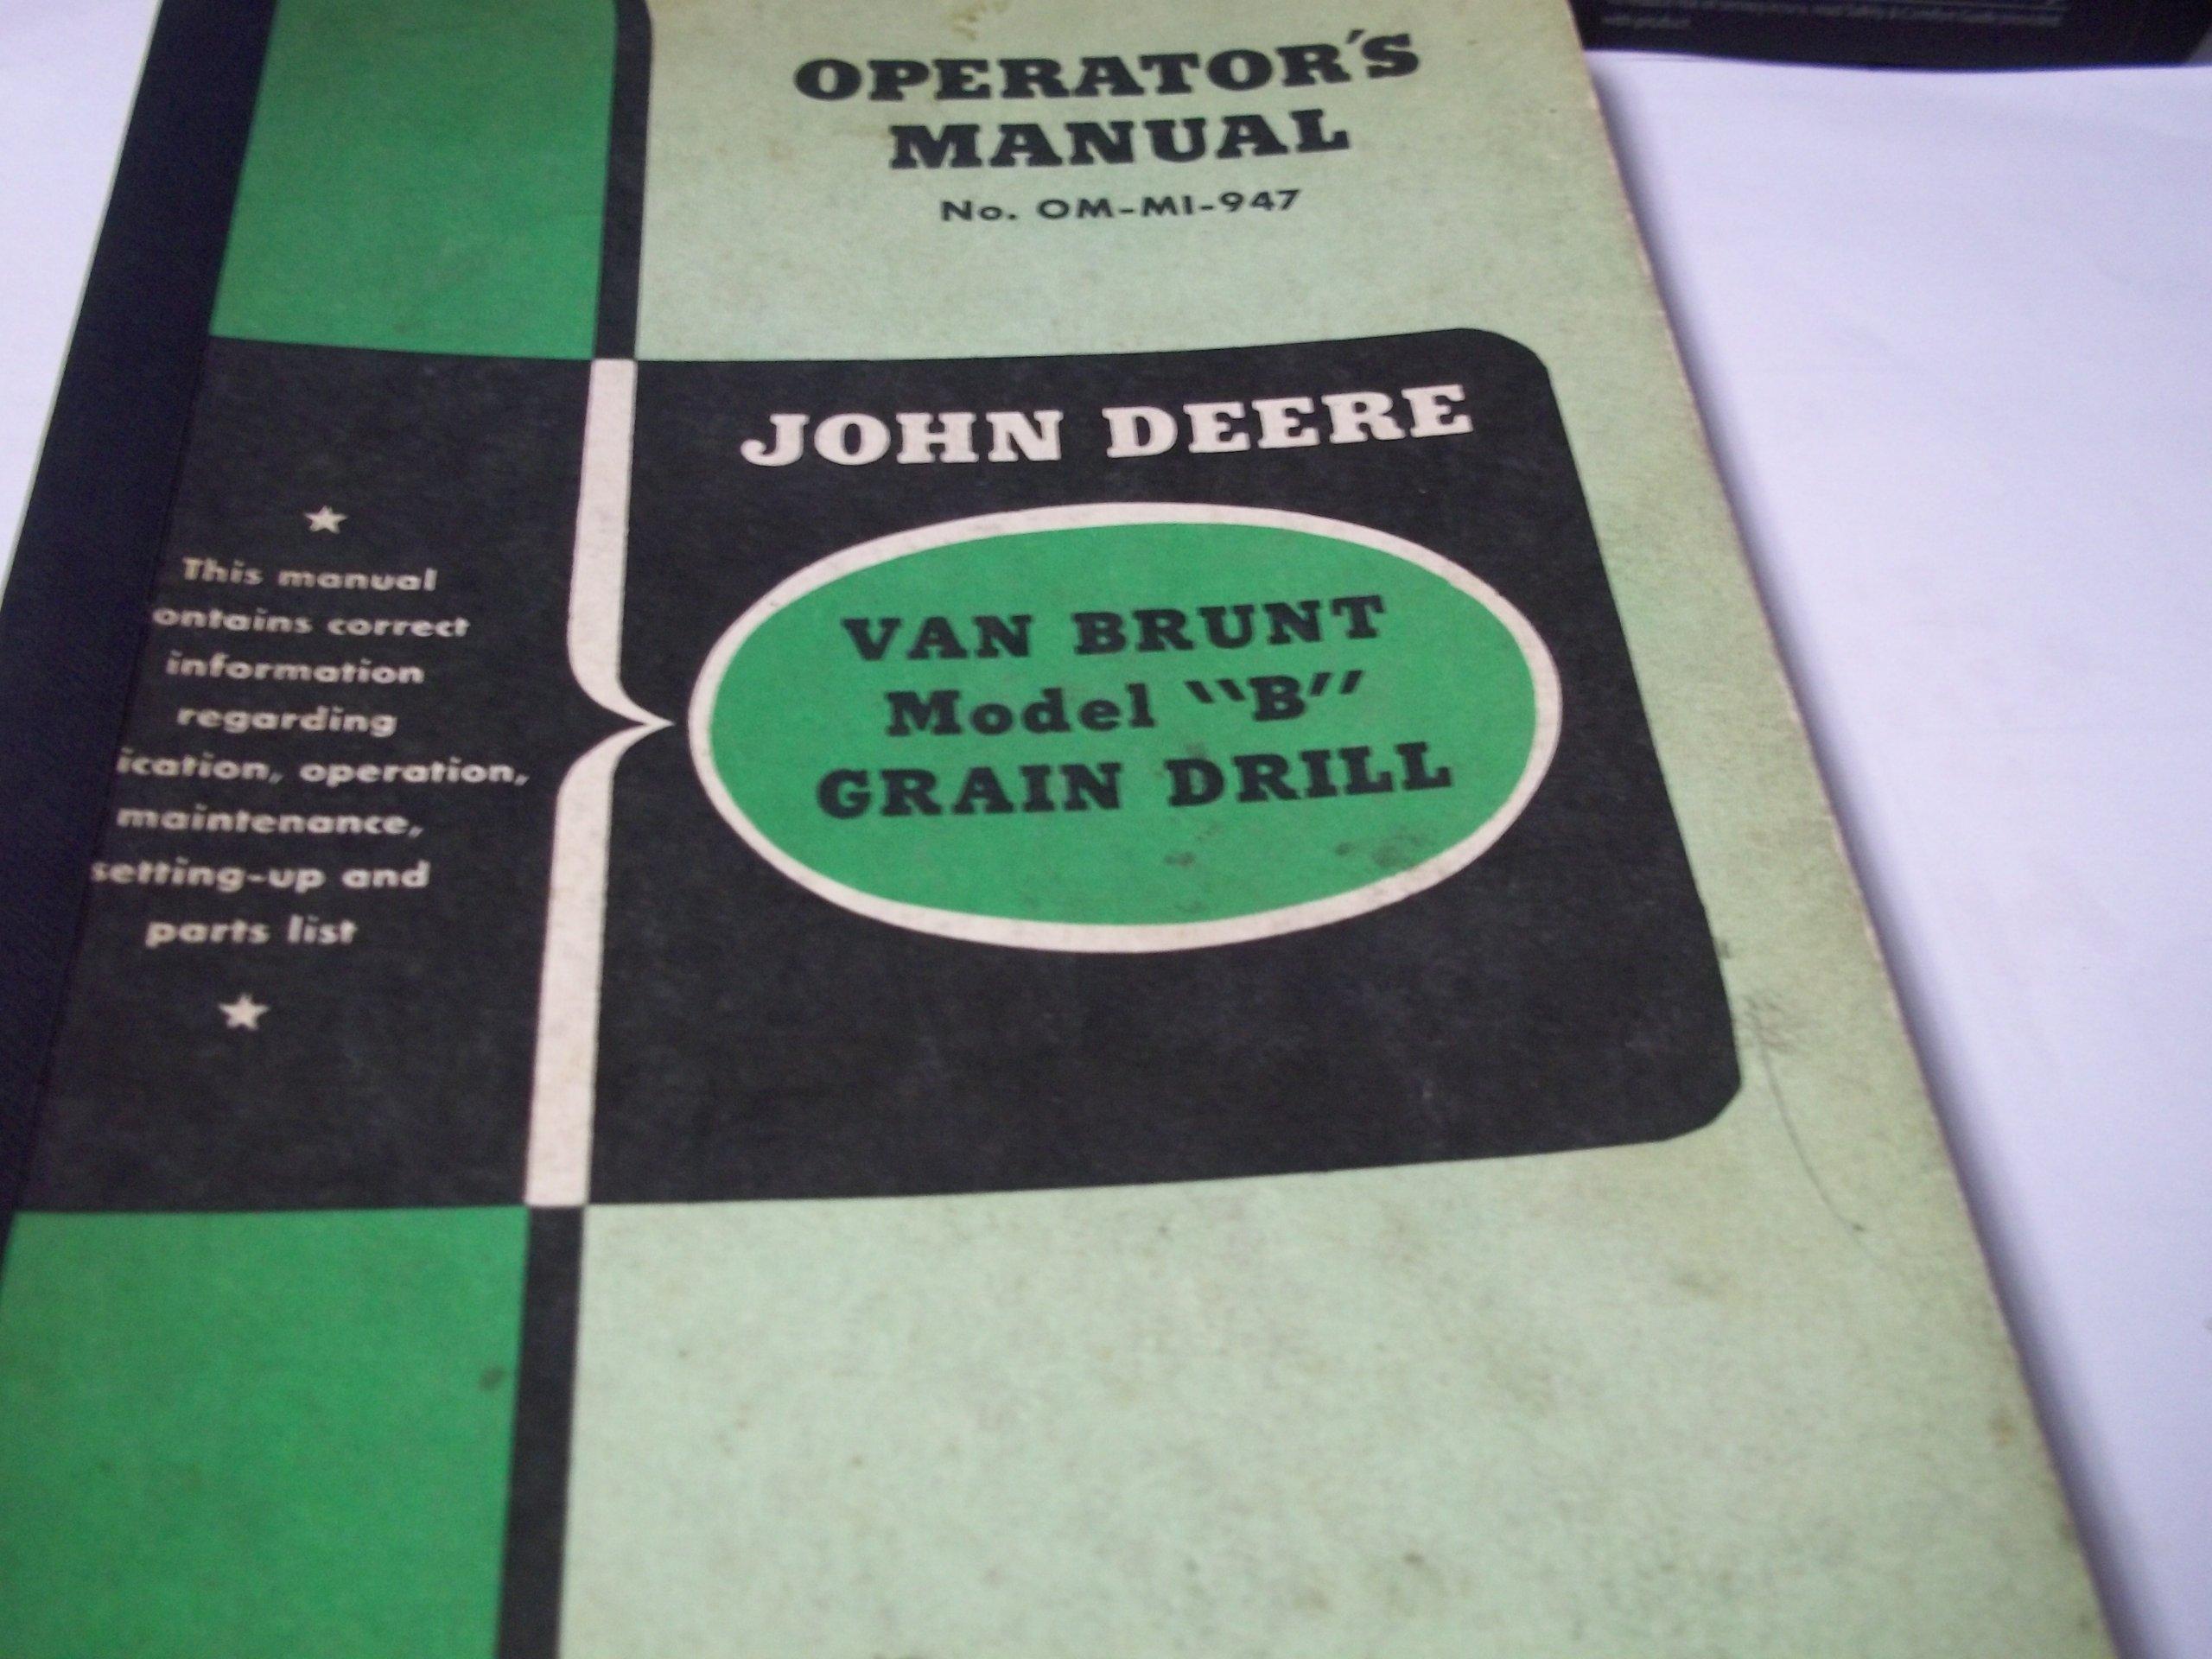 "John Deere Van Brunt Model ""B"" Grain Drill OMM1947 Operator's Manual: John  Deere: Amazon.com: Books"